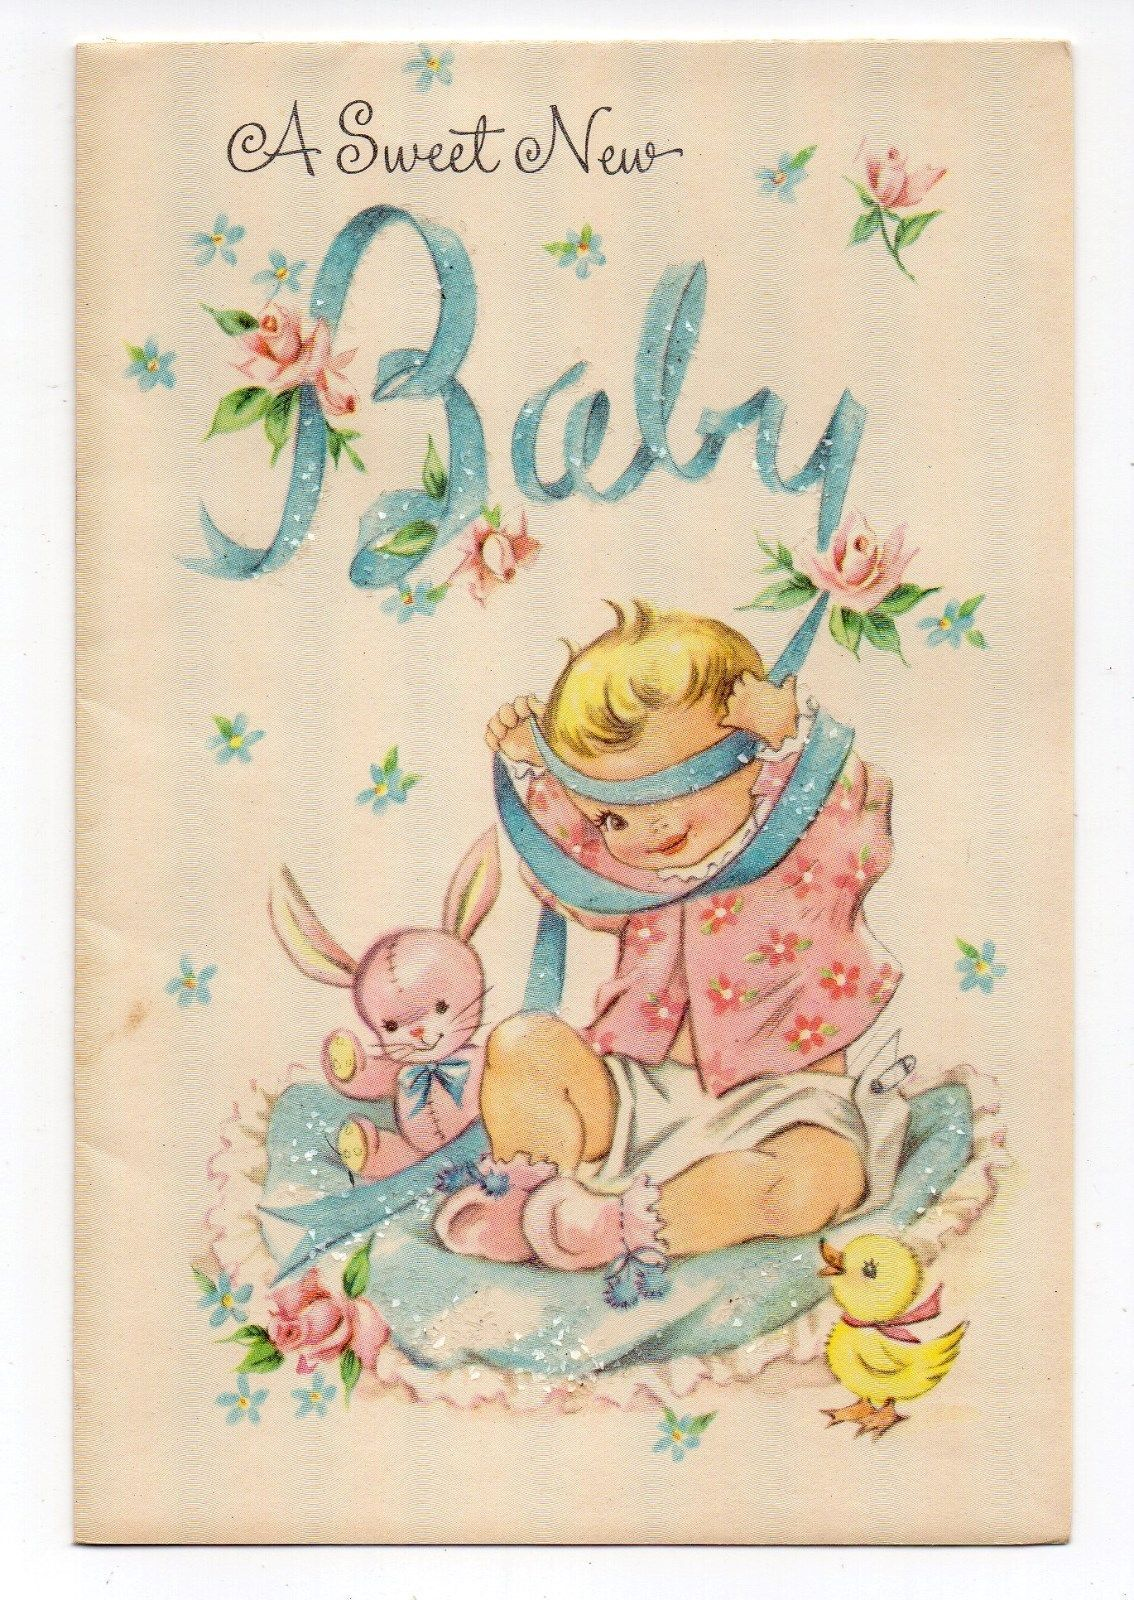 Vintage Coronation Unused New Baby Greeting Card Baby Girl Bunny